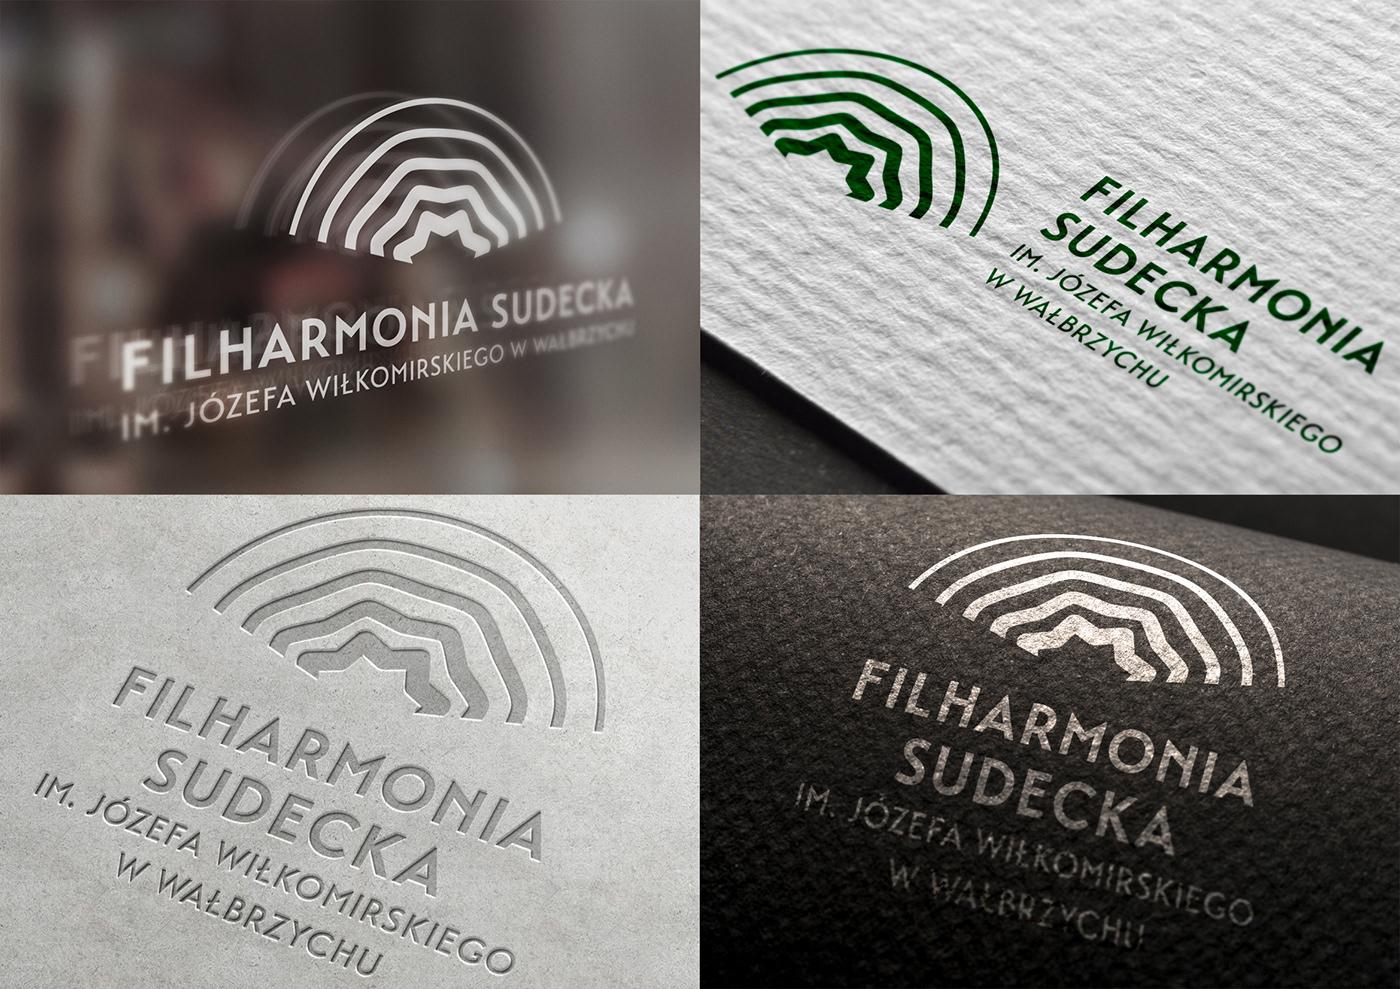 filharmonia identity identyfikacja wizualna logo mountain music oak orchestra philharmonic sound